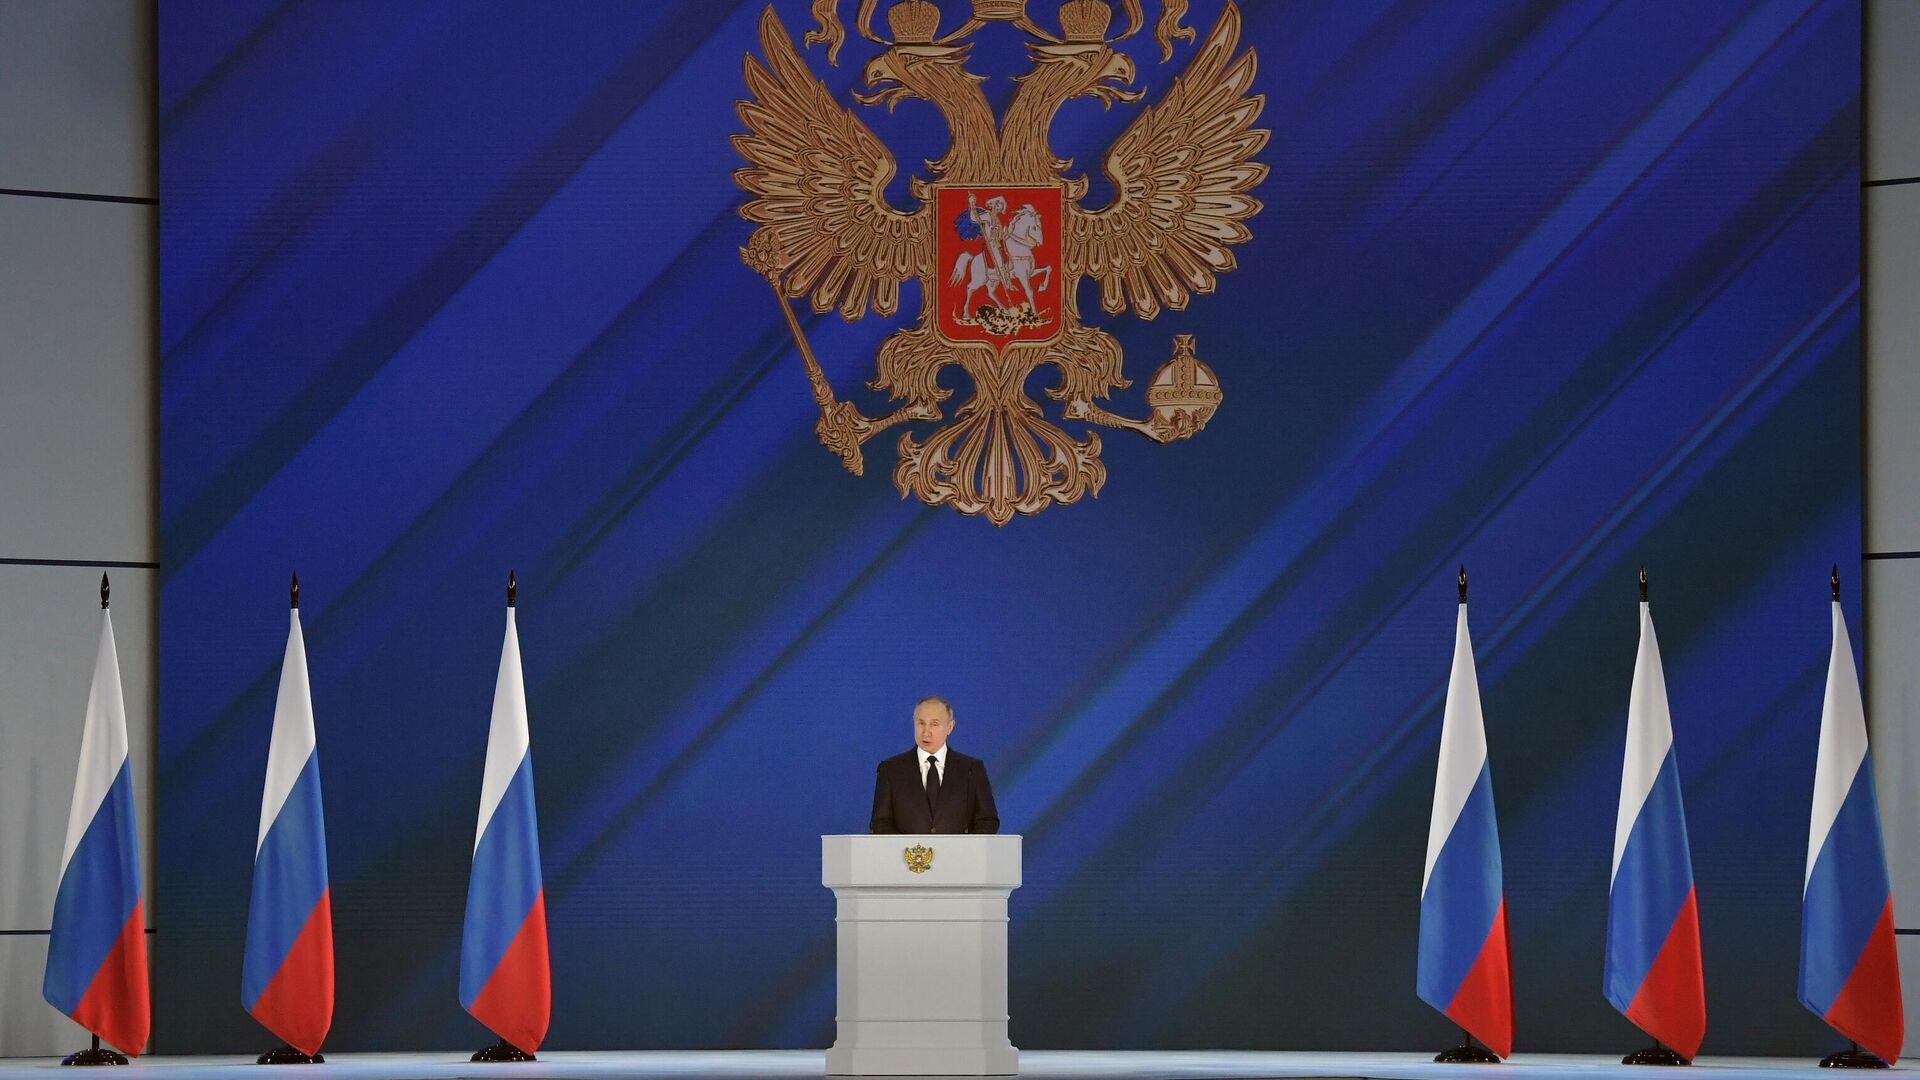 El mensaje anual del presidente ruso, Vladímir Putin, a la Asamblea Federal, el 21 de abril de 2021 - Sputnik Mundo, 1920, 21.04.2021